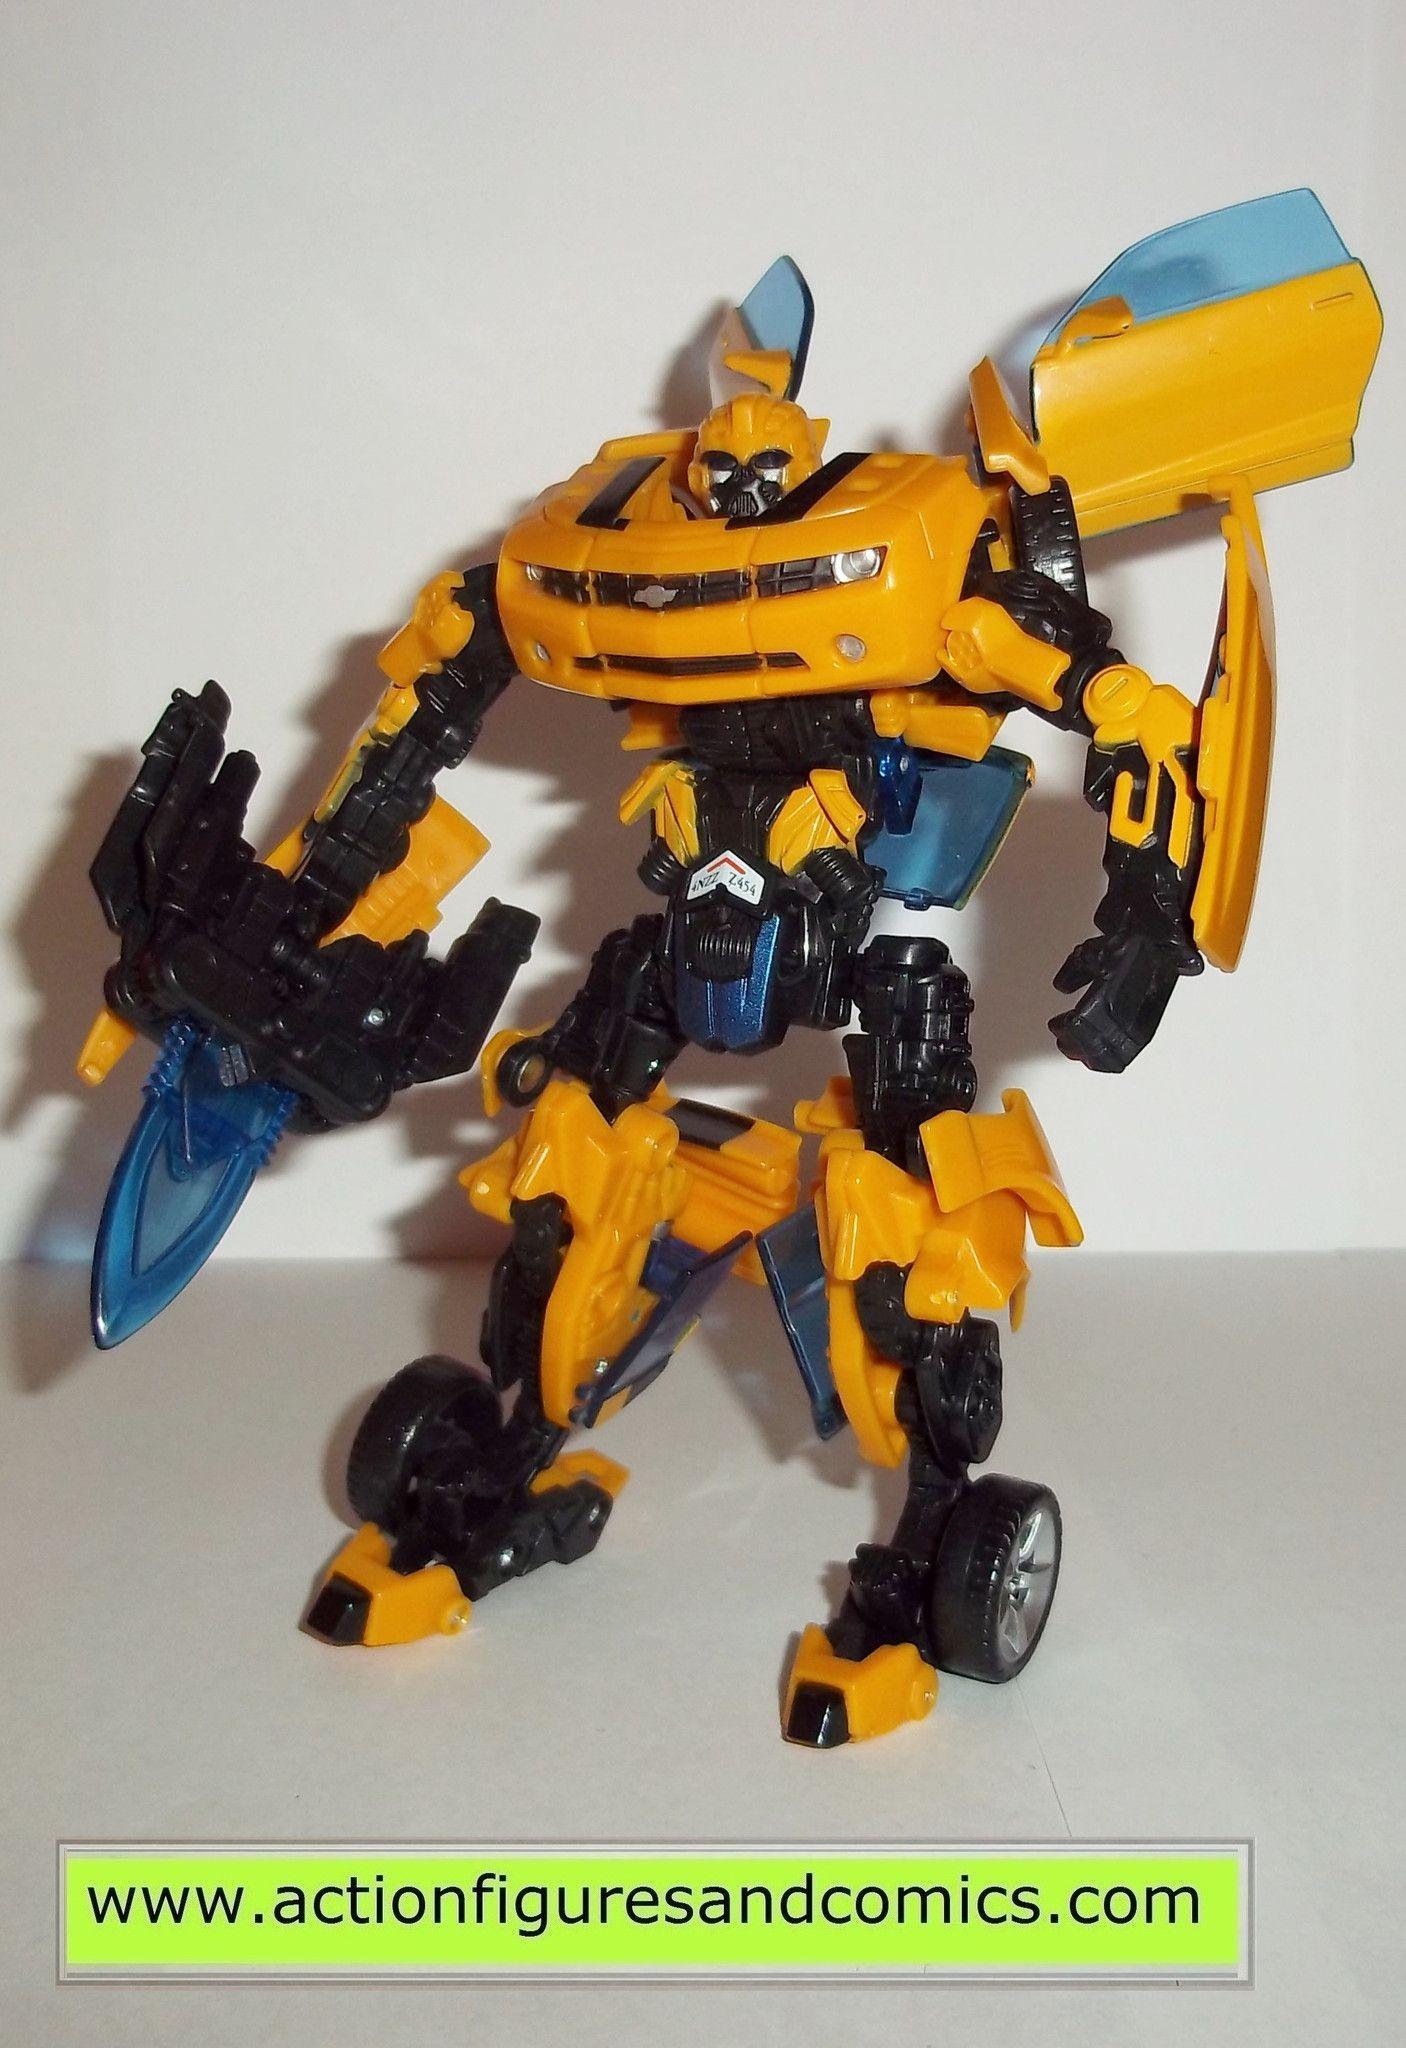 Concept Bumblebee 2007 Action Camaro Transformers Movie Yellow oxerCBdW